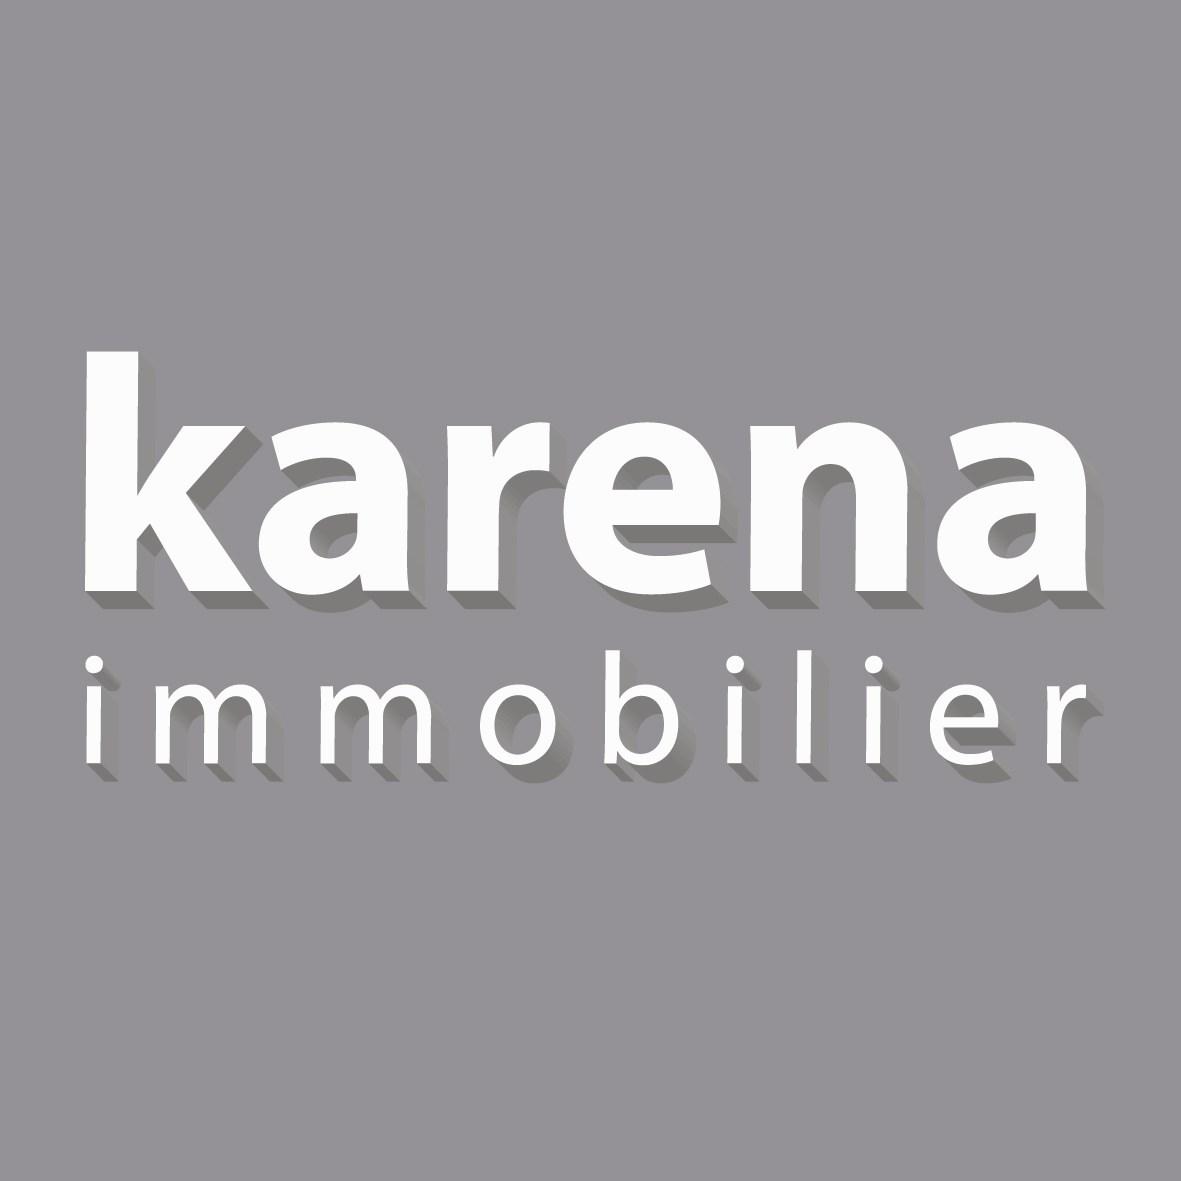 KARENA IMMOBILIER